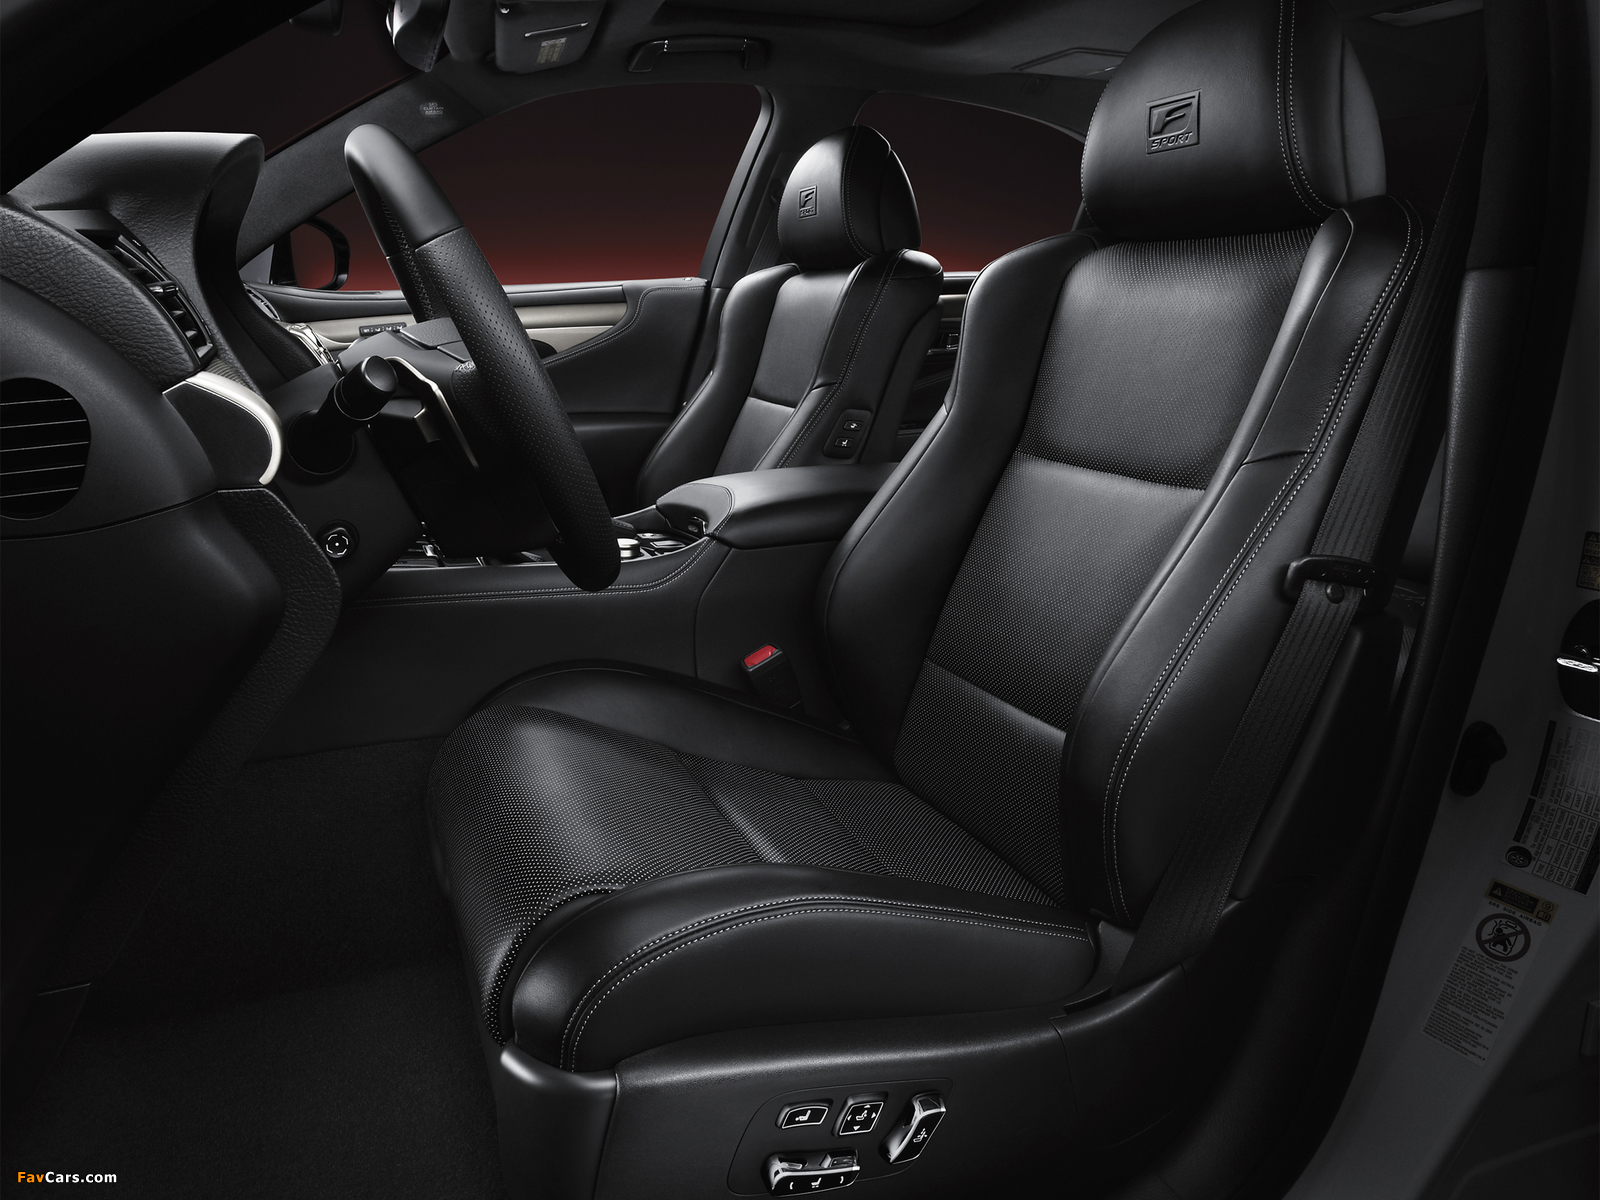 Lexus LS 460 F-Sport 2012 images (1600 x 1200)